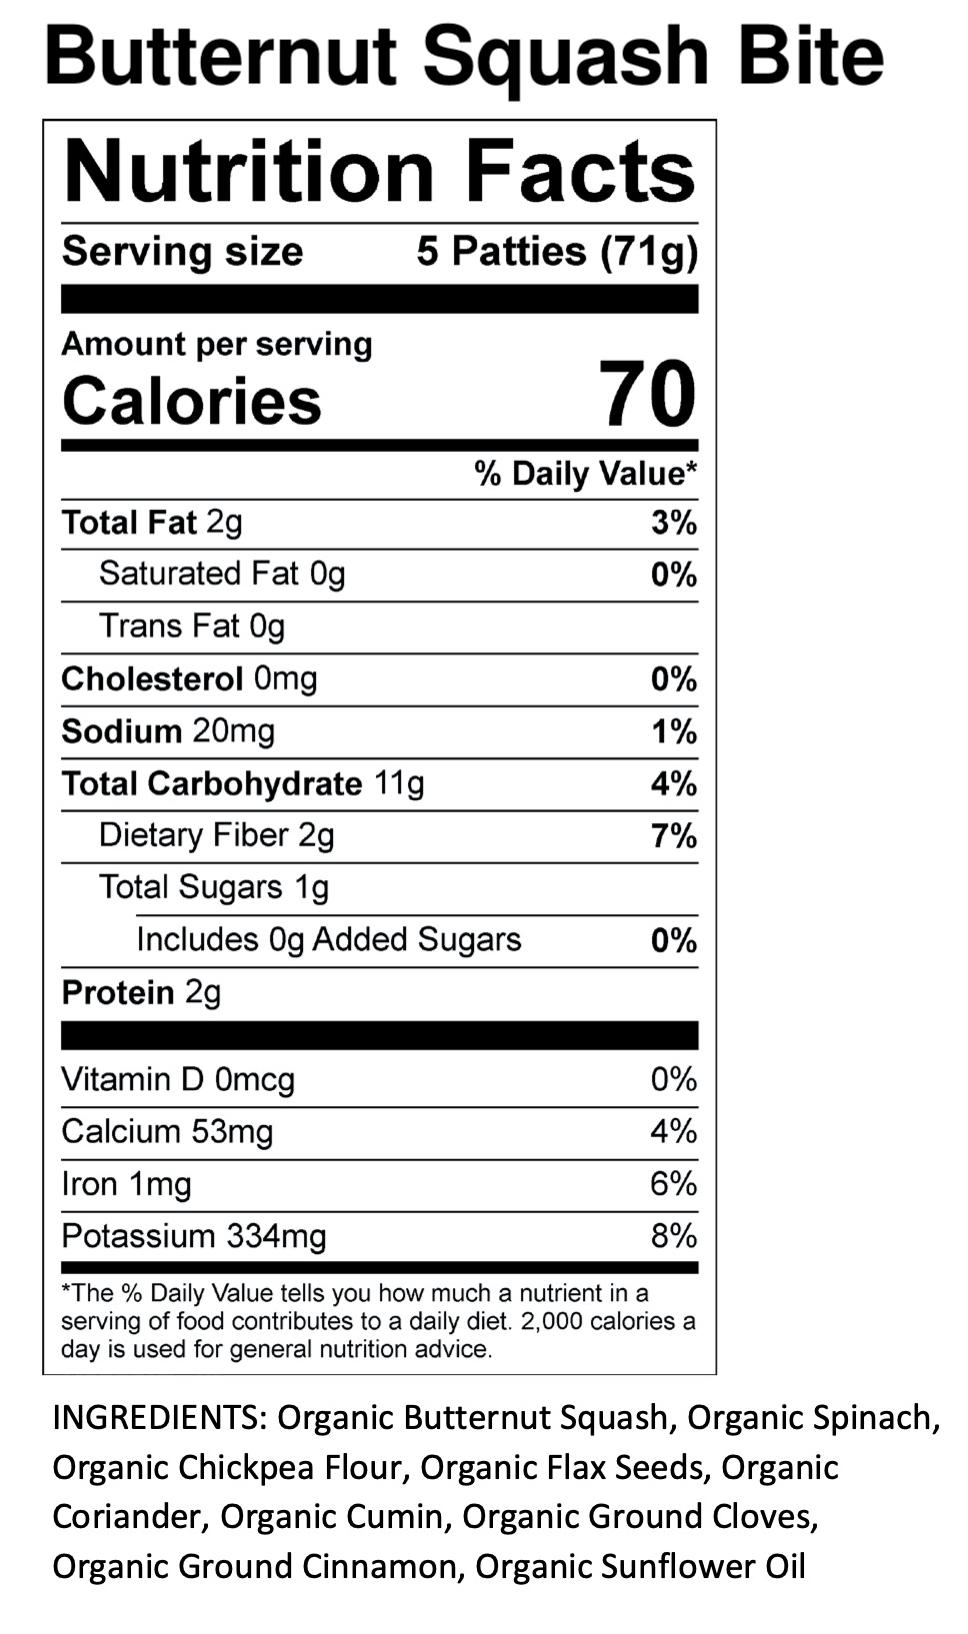 Yumi Butternut Squash Bite nutrition facts